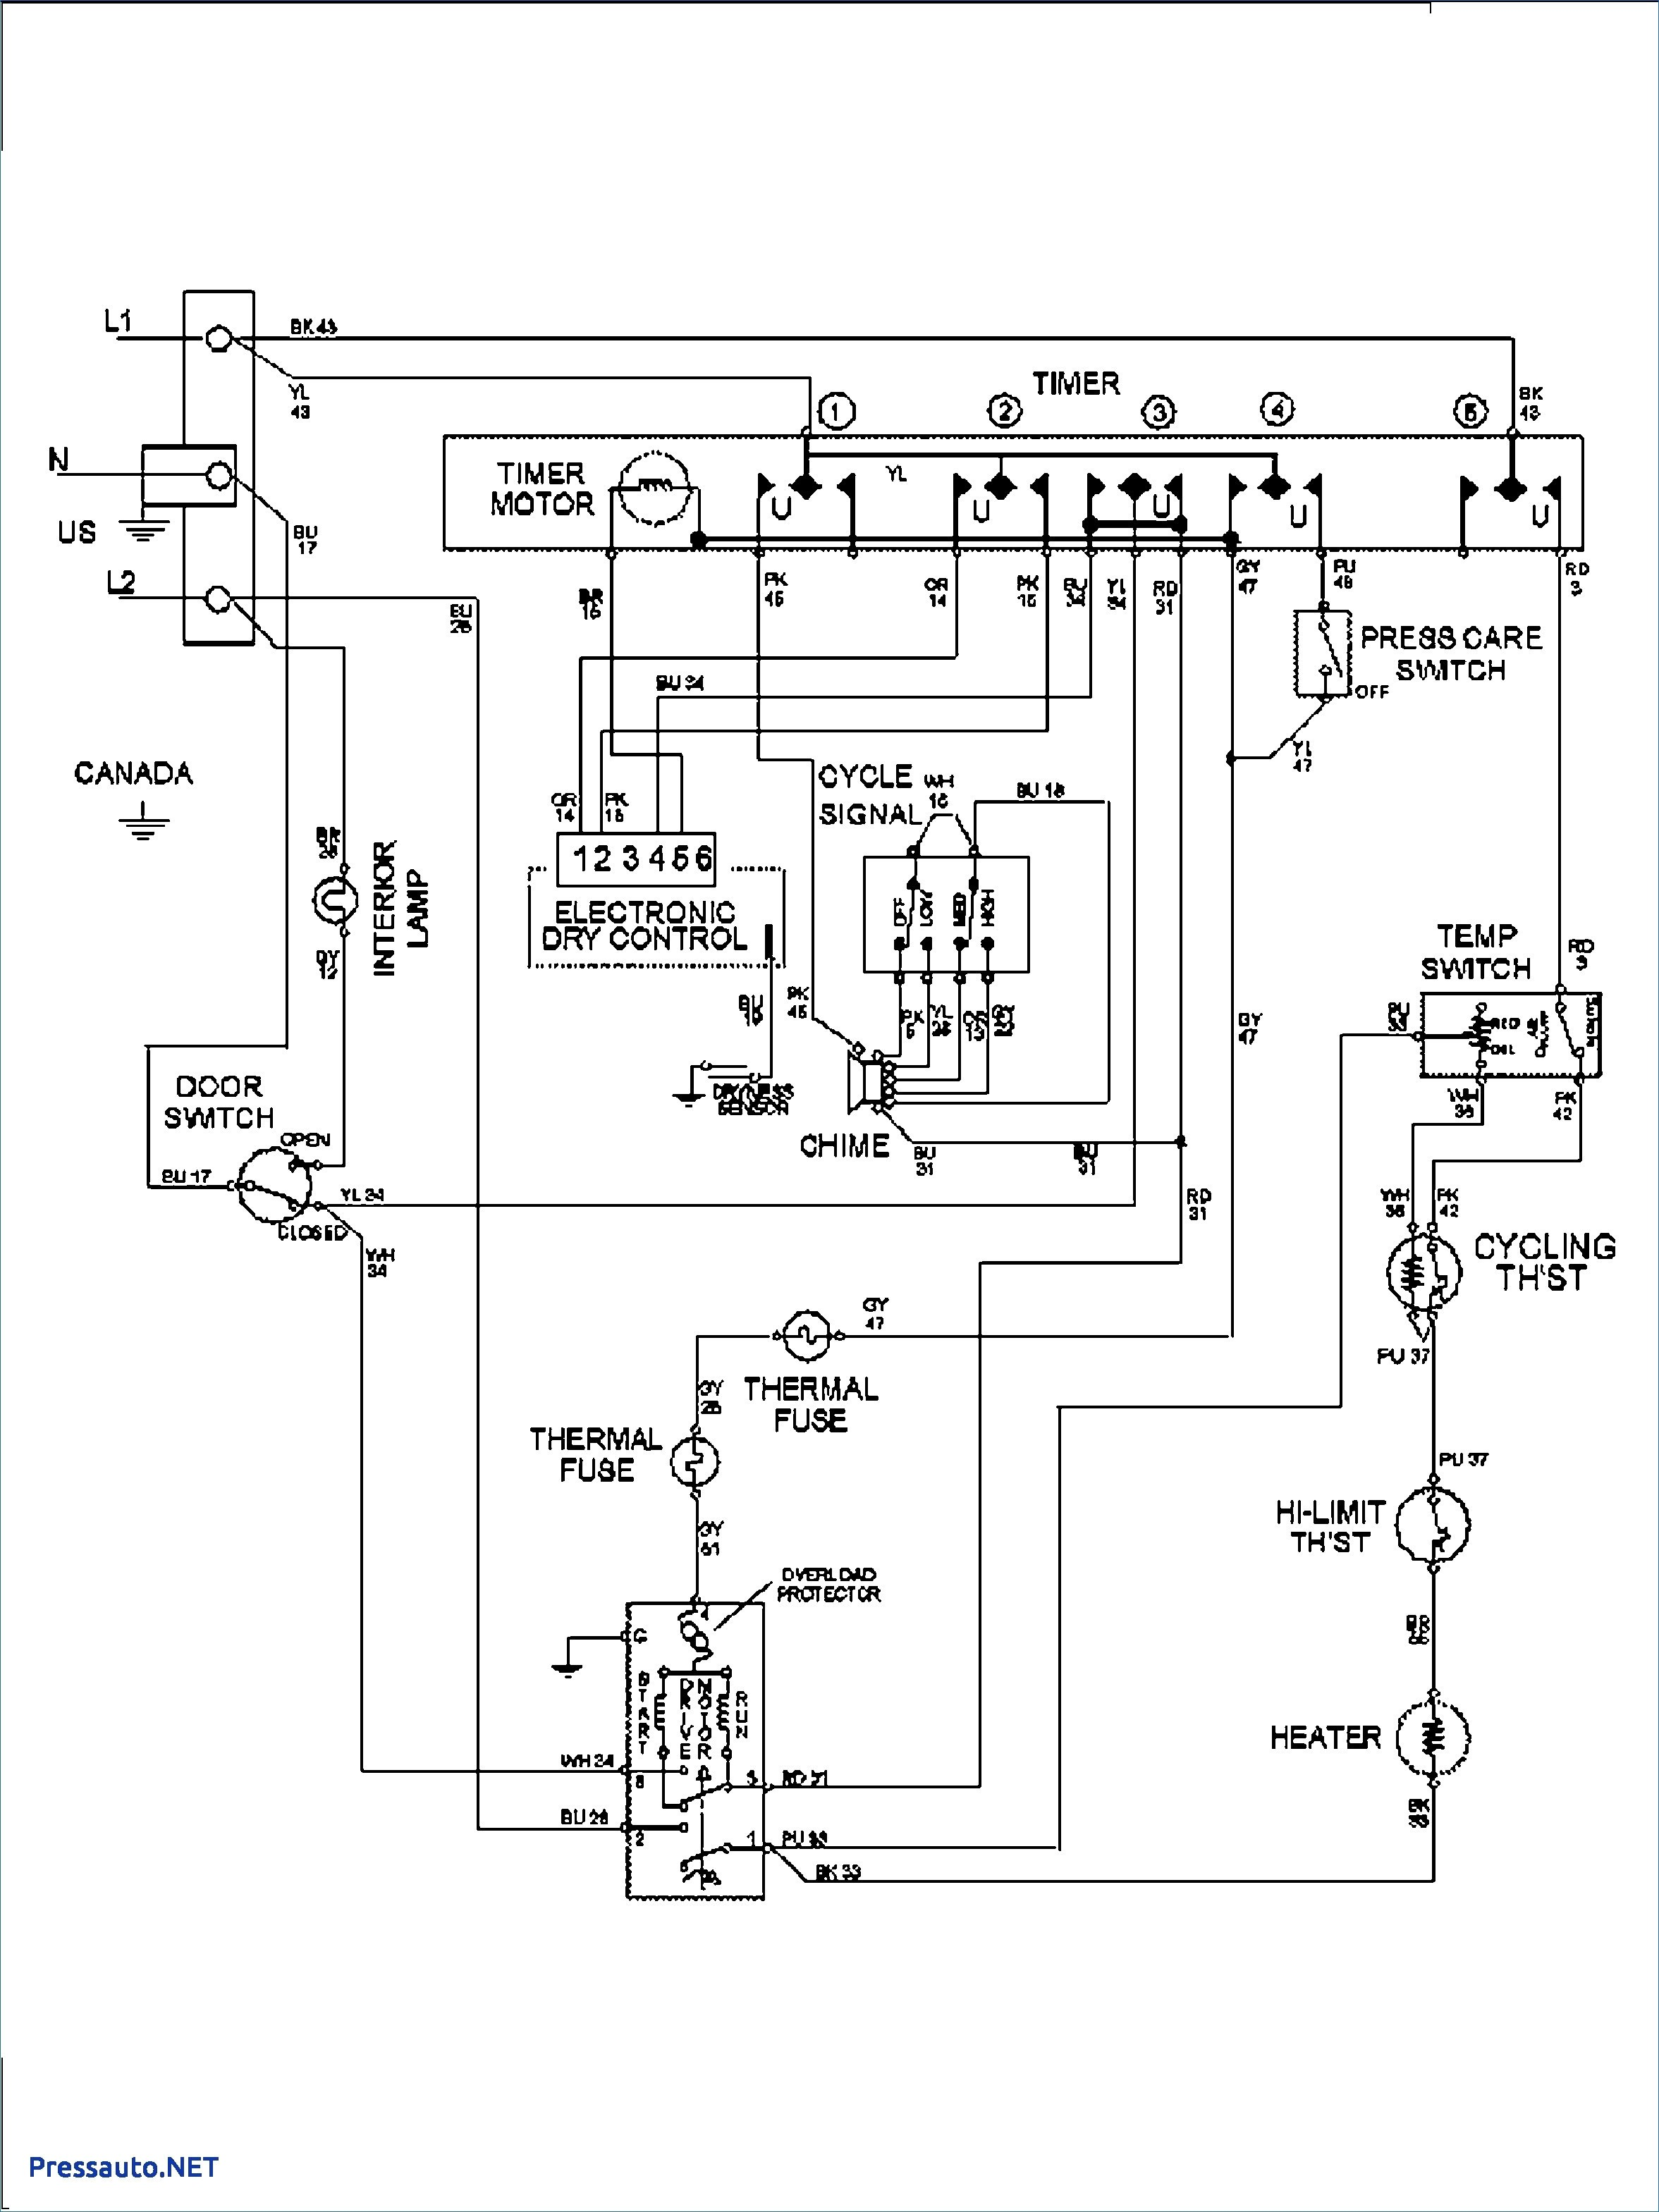 Wiring Diagram for Maytag Dryer Wiring Diagram for Maytag Dryer Simplified Shapes Maytag Washer